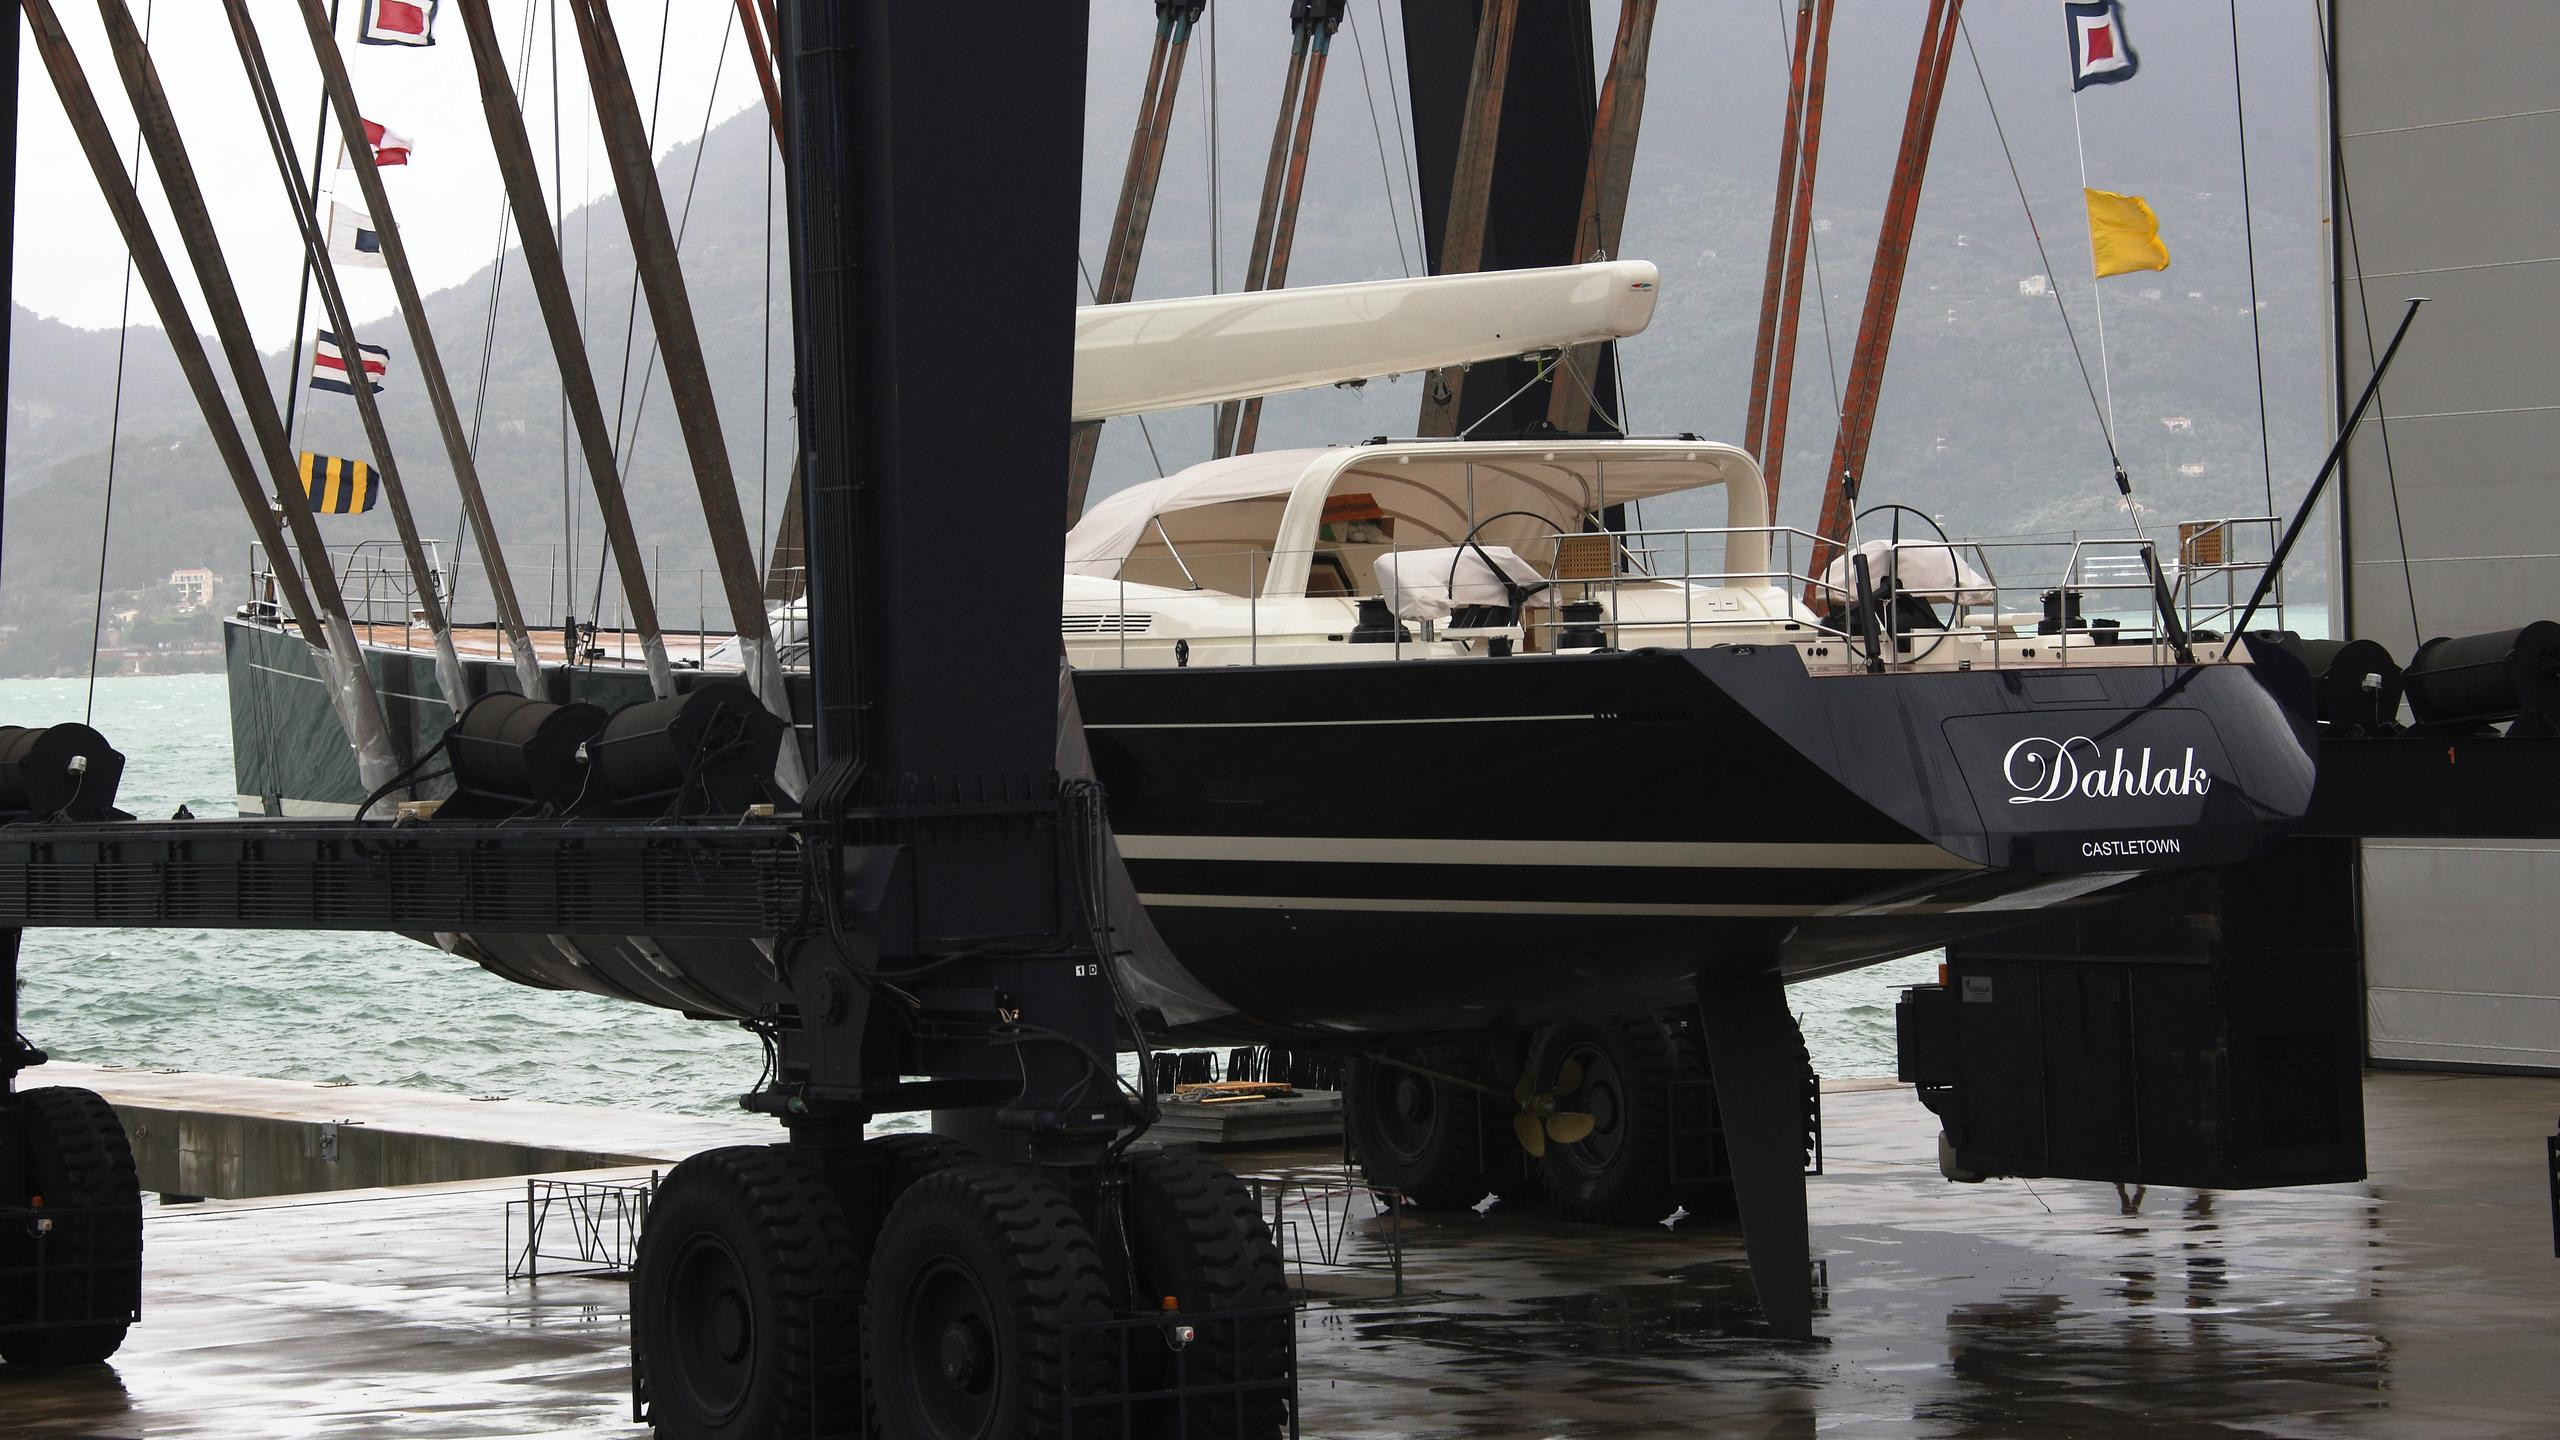 dahlak-sailing-yacht-perini-navi-2016-38m-launch-party